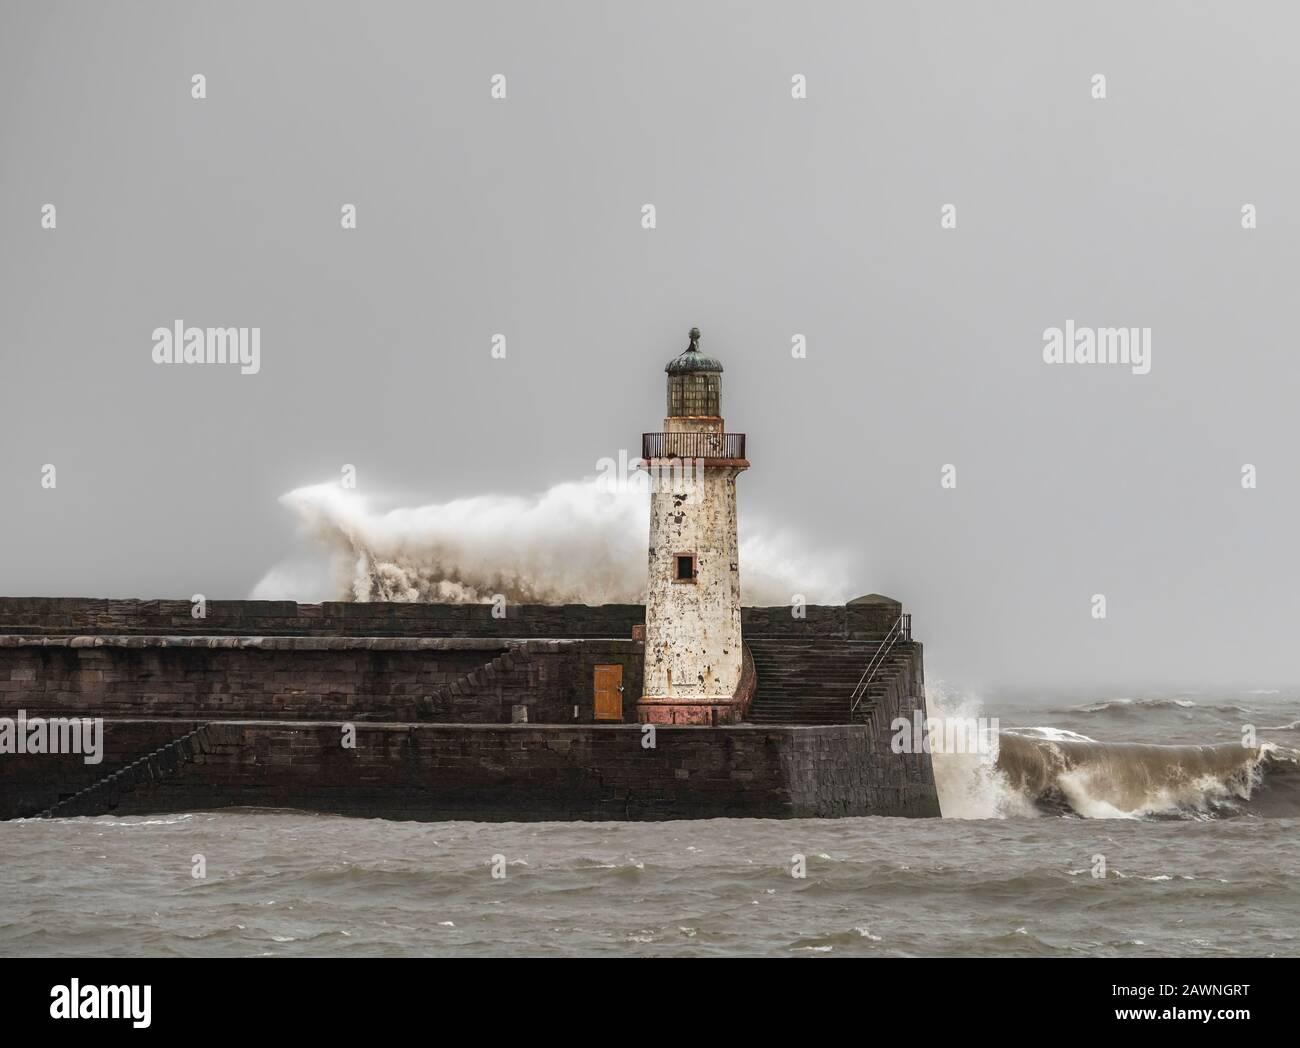 Storm Ciara battering a light house on the Cumbrian coast Stock Photo